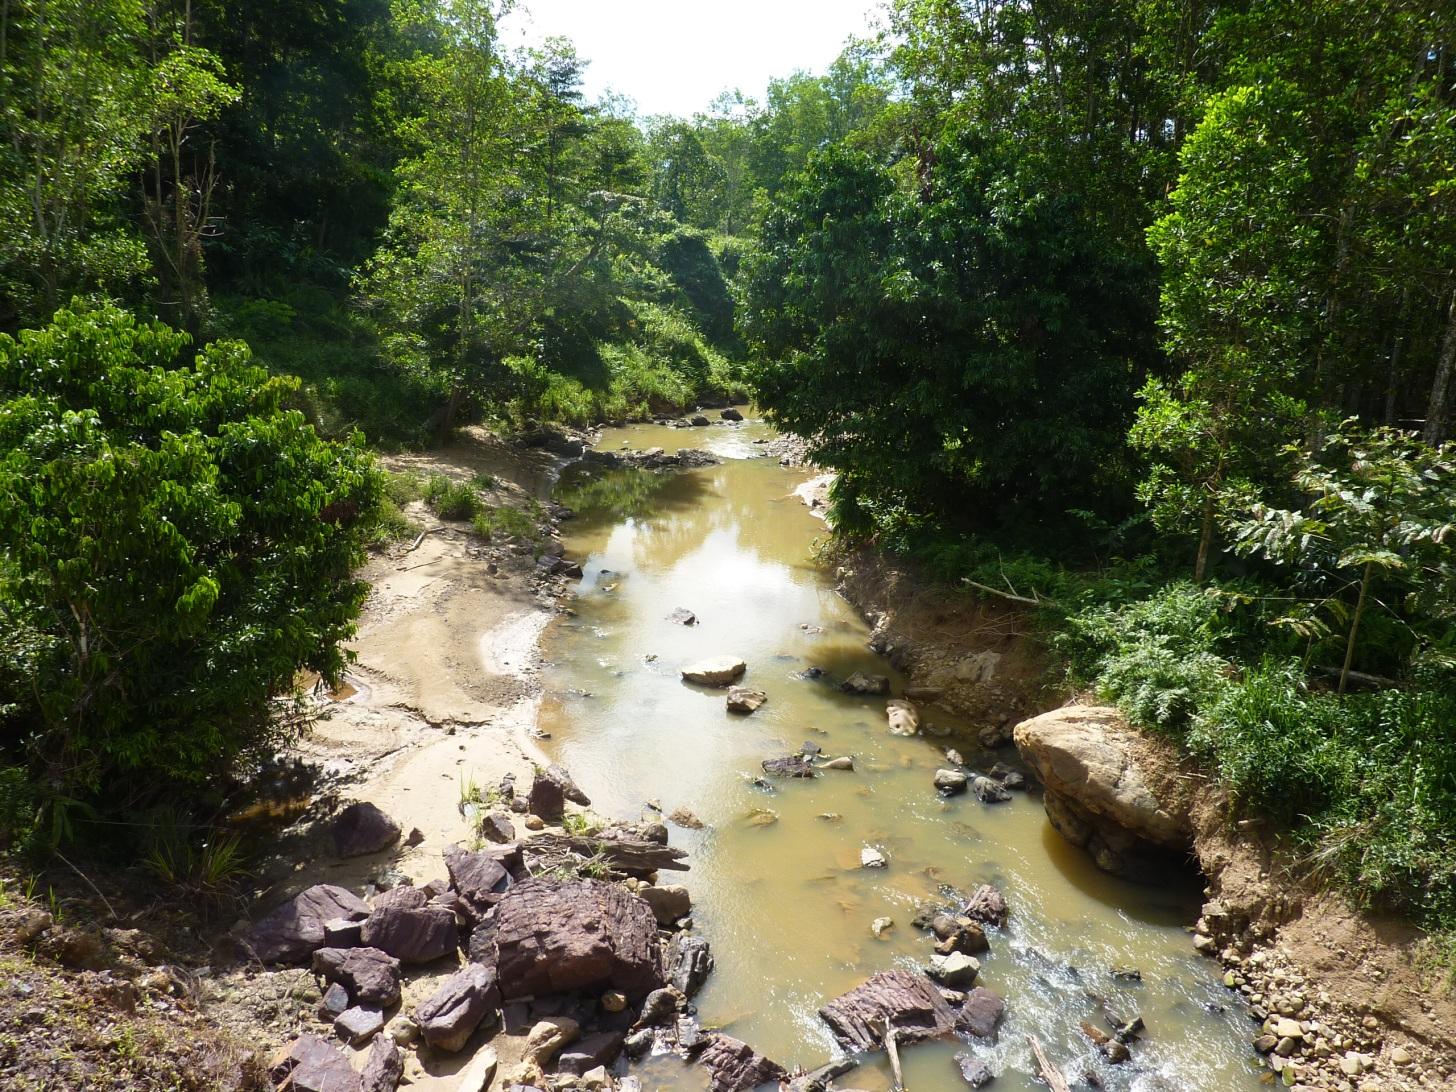 River riparian zone in oil palm plantation, Sabah, Malaysia.  Image: Claudia Gray